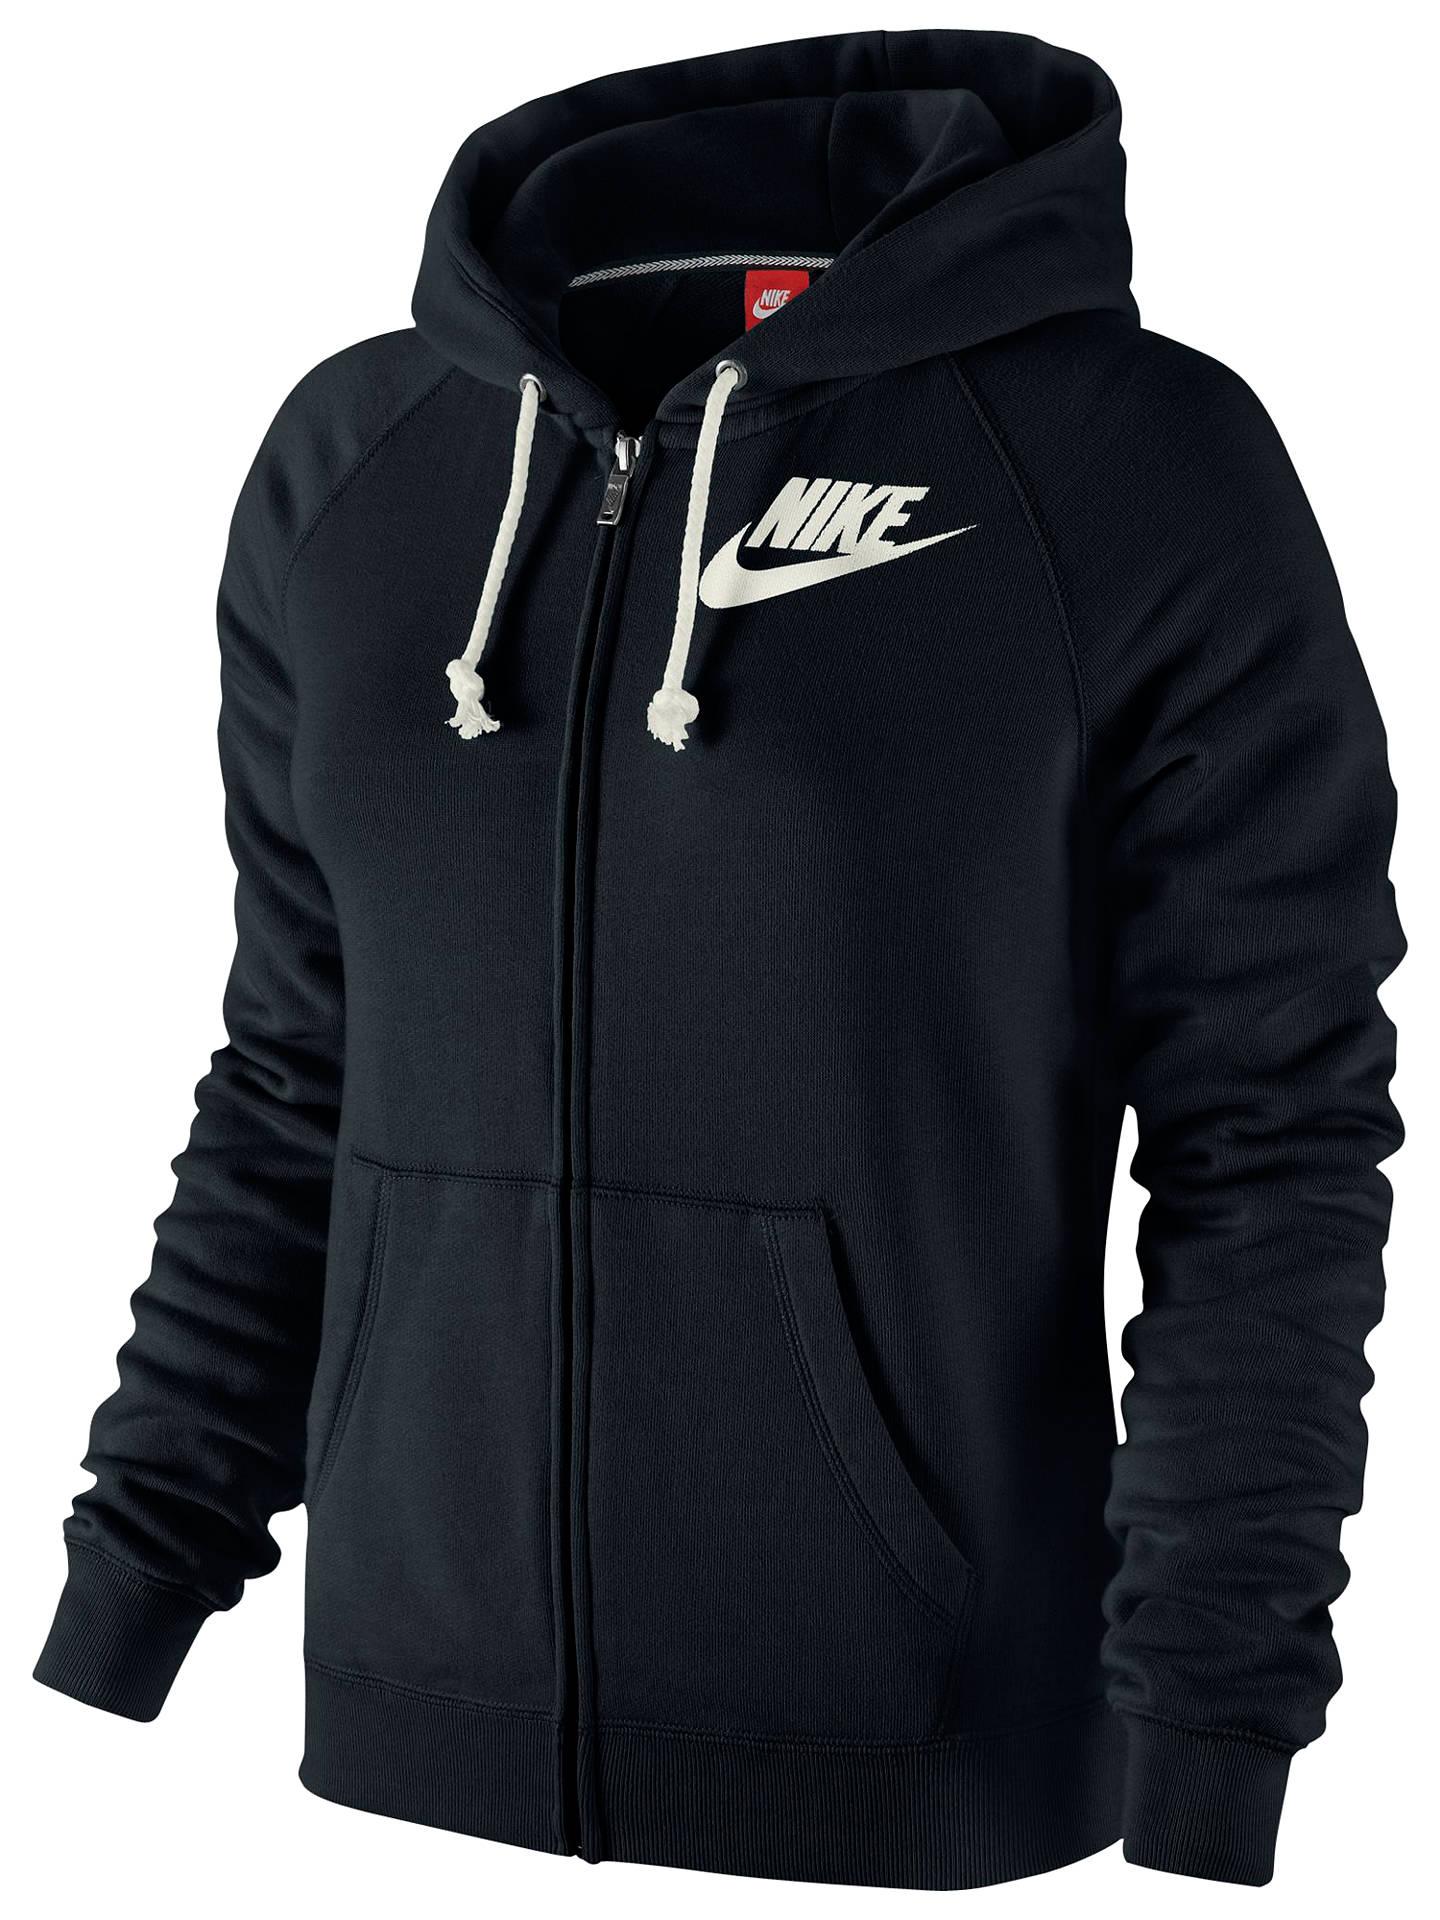 4baa8de90fda Buy Nike Women s Rally Futura Full Zip Hoodie